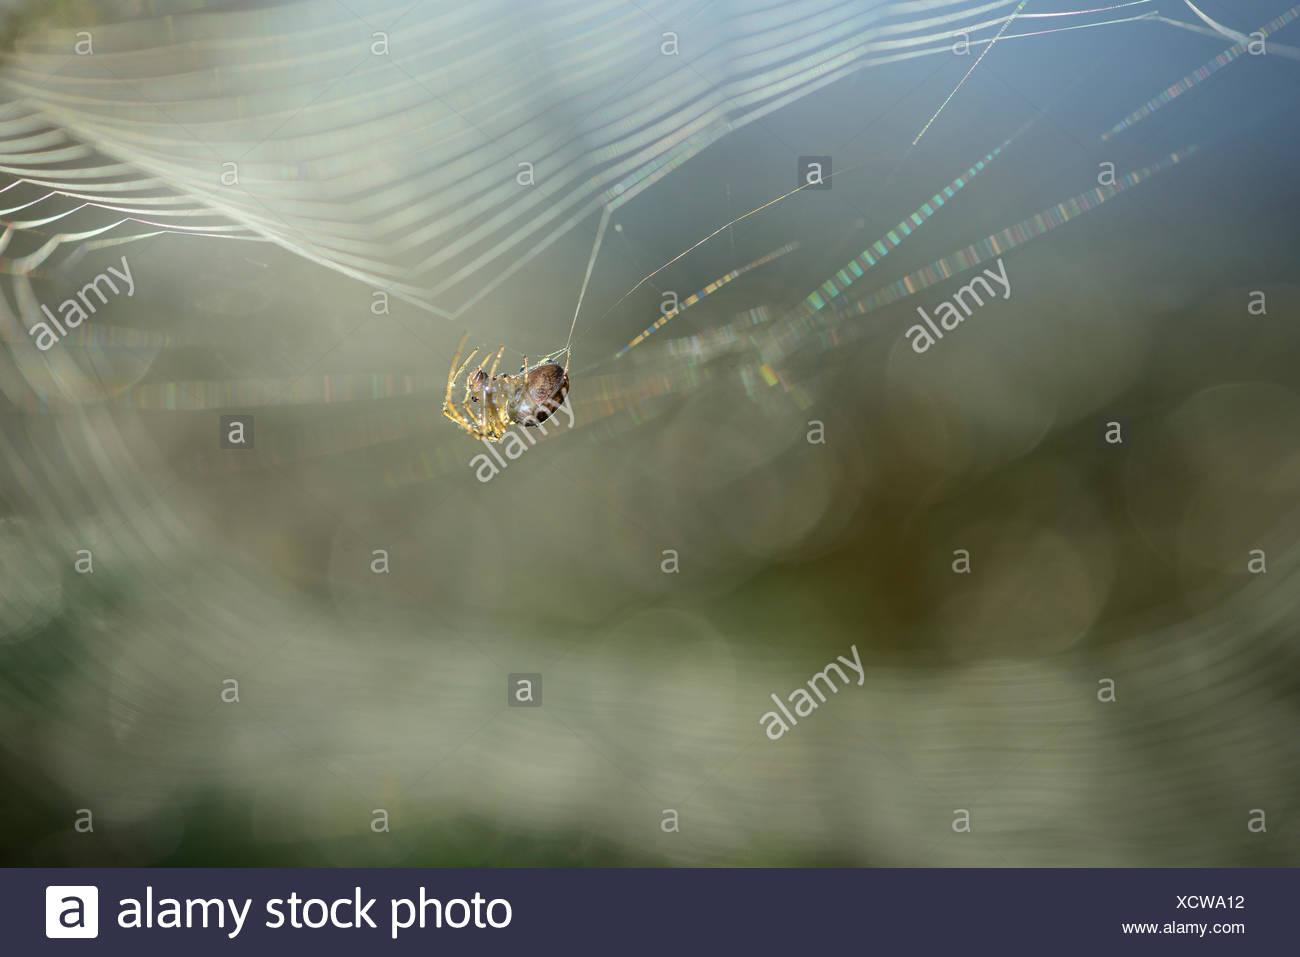 European garden spider, Araneus diadematus, weaving spider's web - Stock Image